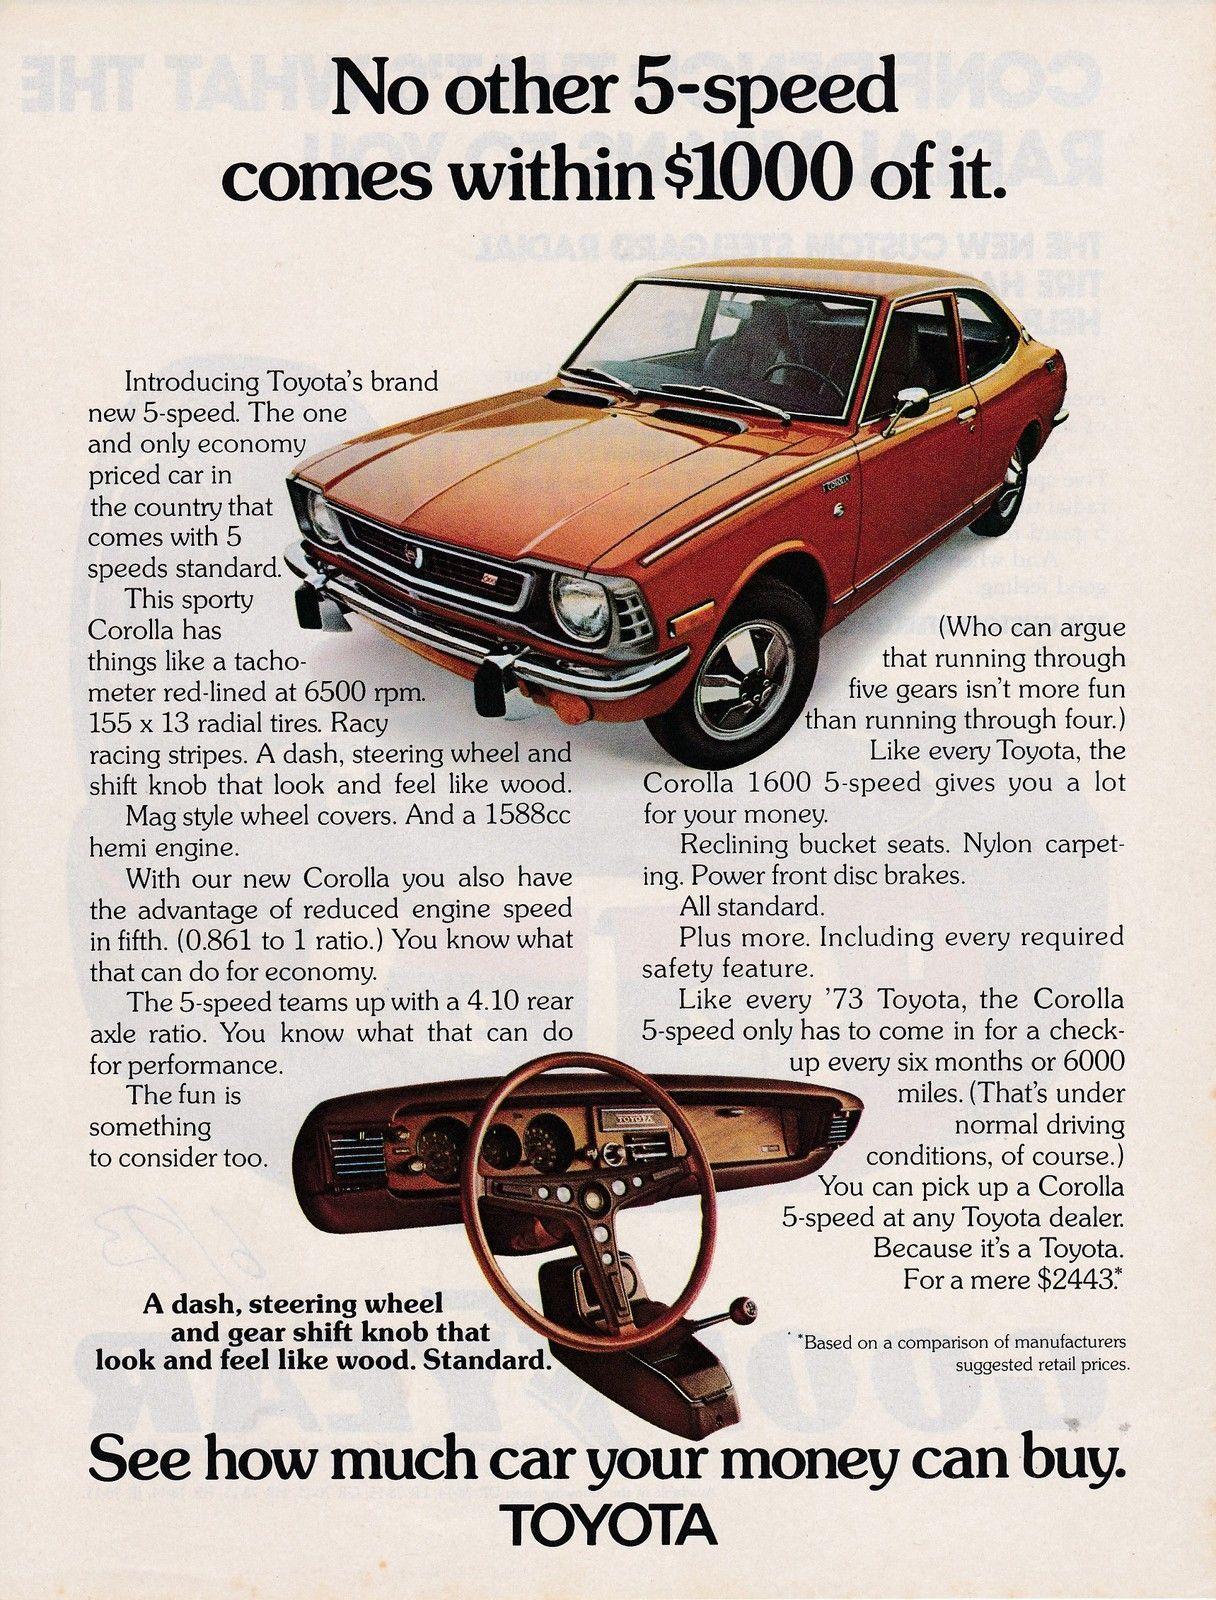 1973 Toyota Corolla 5 Speed Coupe Sharp 825x11 Inch Usa Magazine Land Cruiser Ebay 8 25x11 Advert